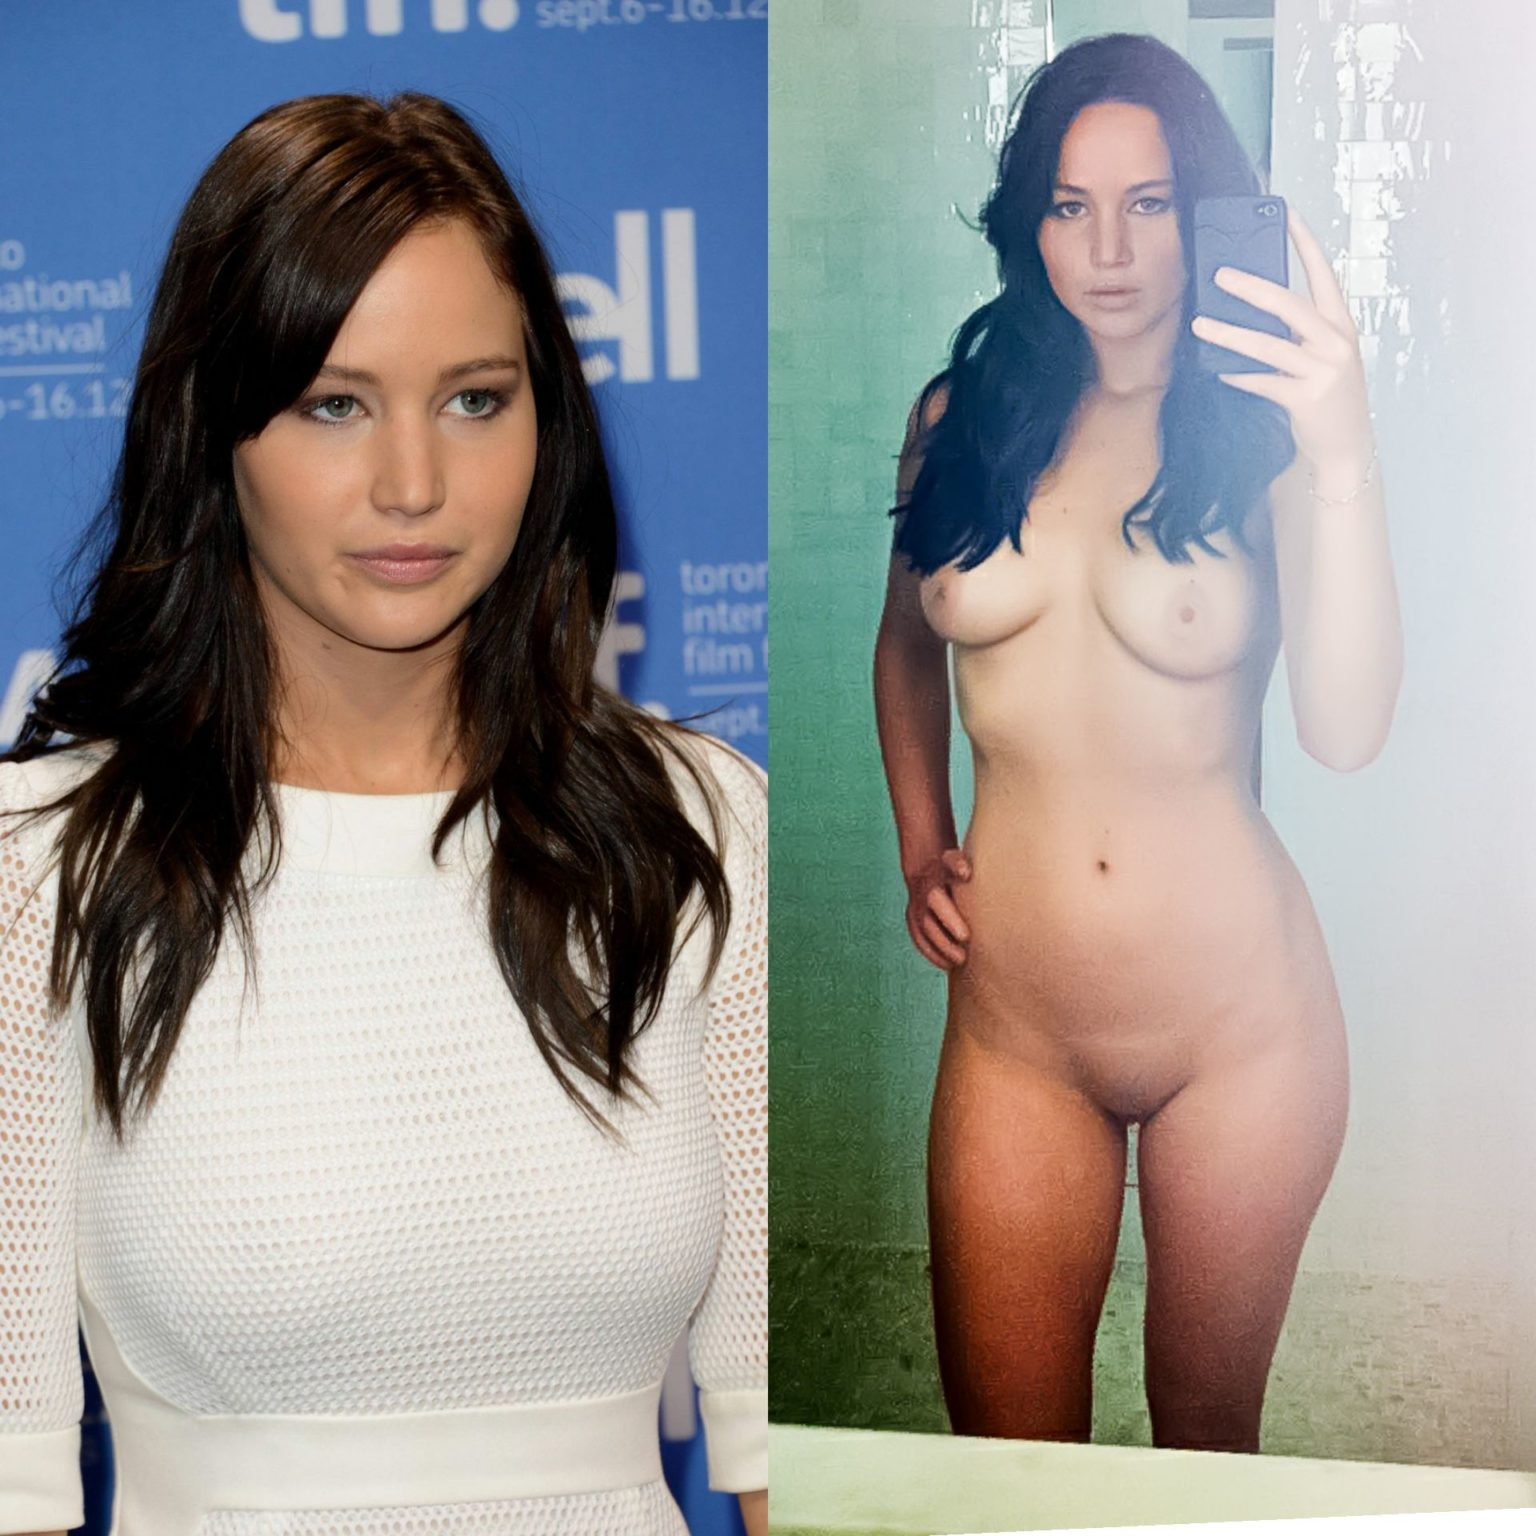 Hot naked celebrities